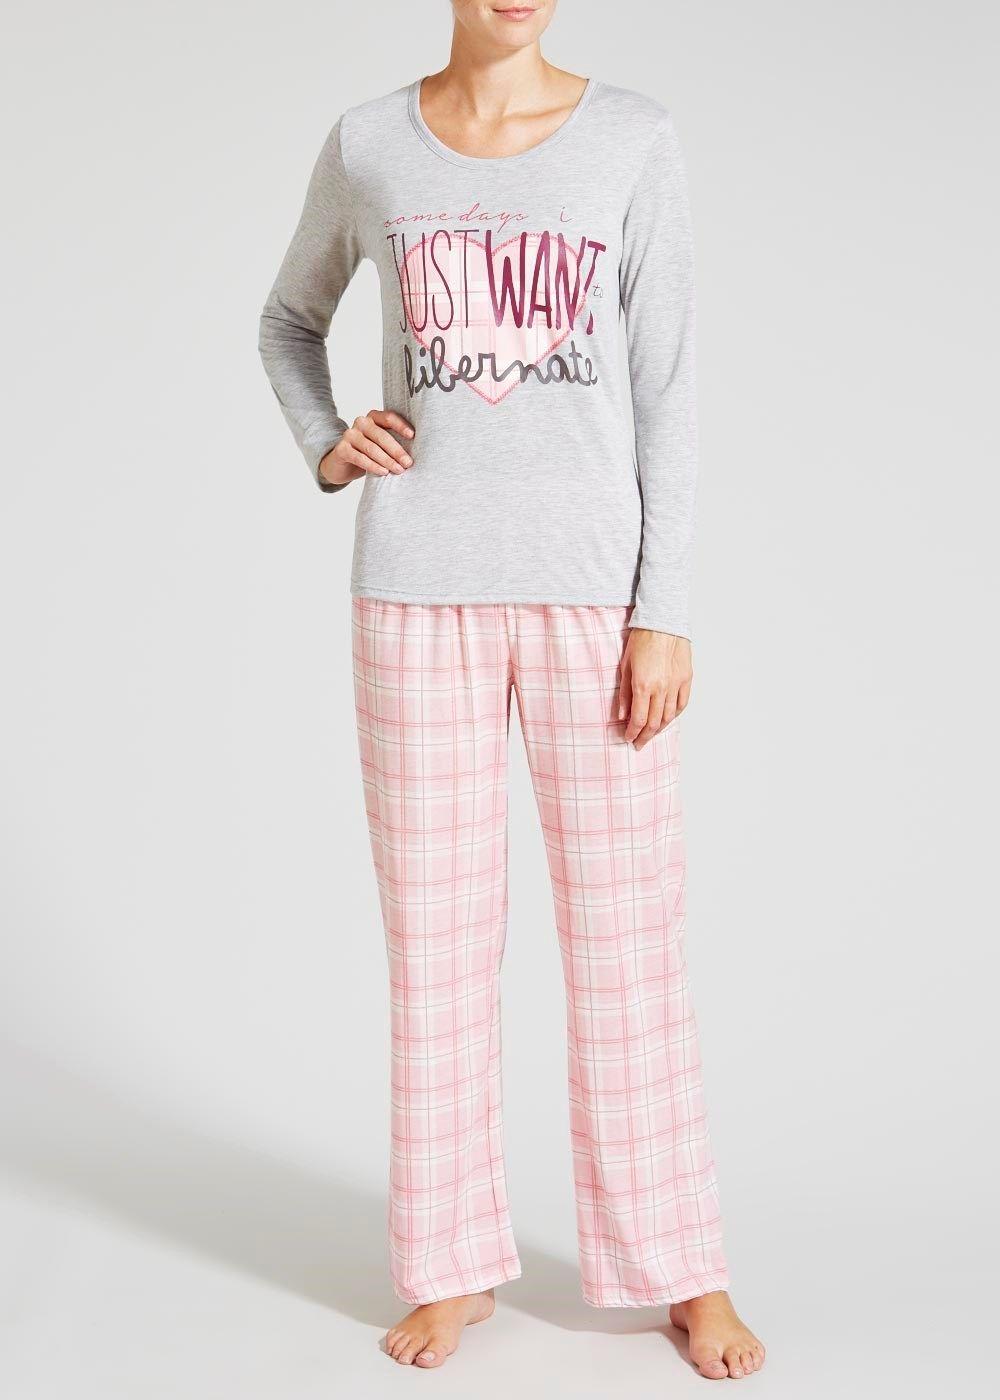 Slogan Check Jersey Pyjama Set